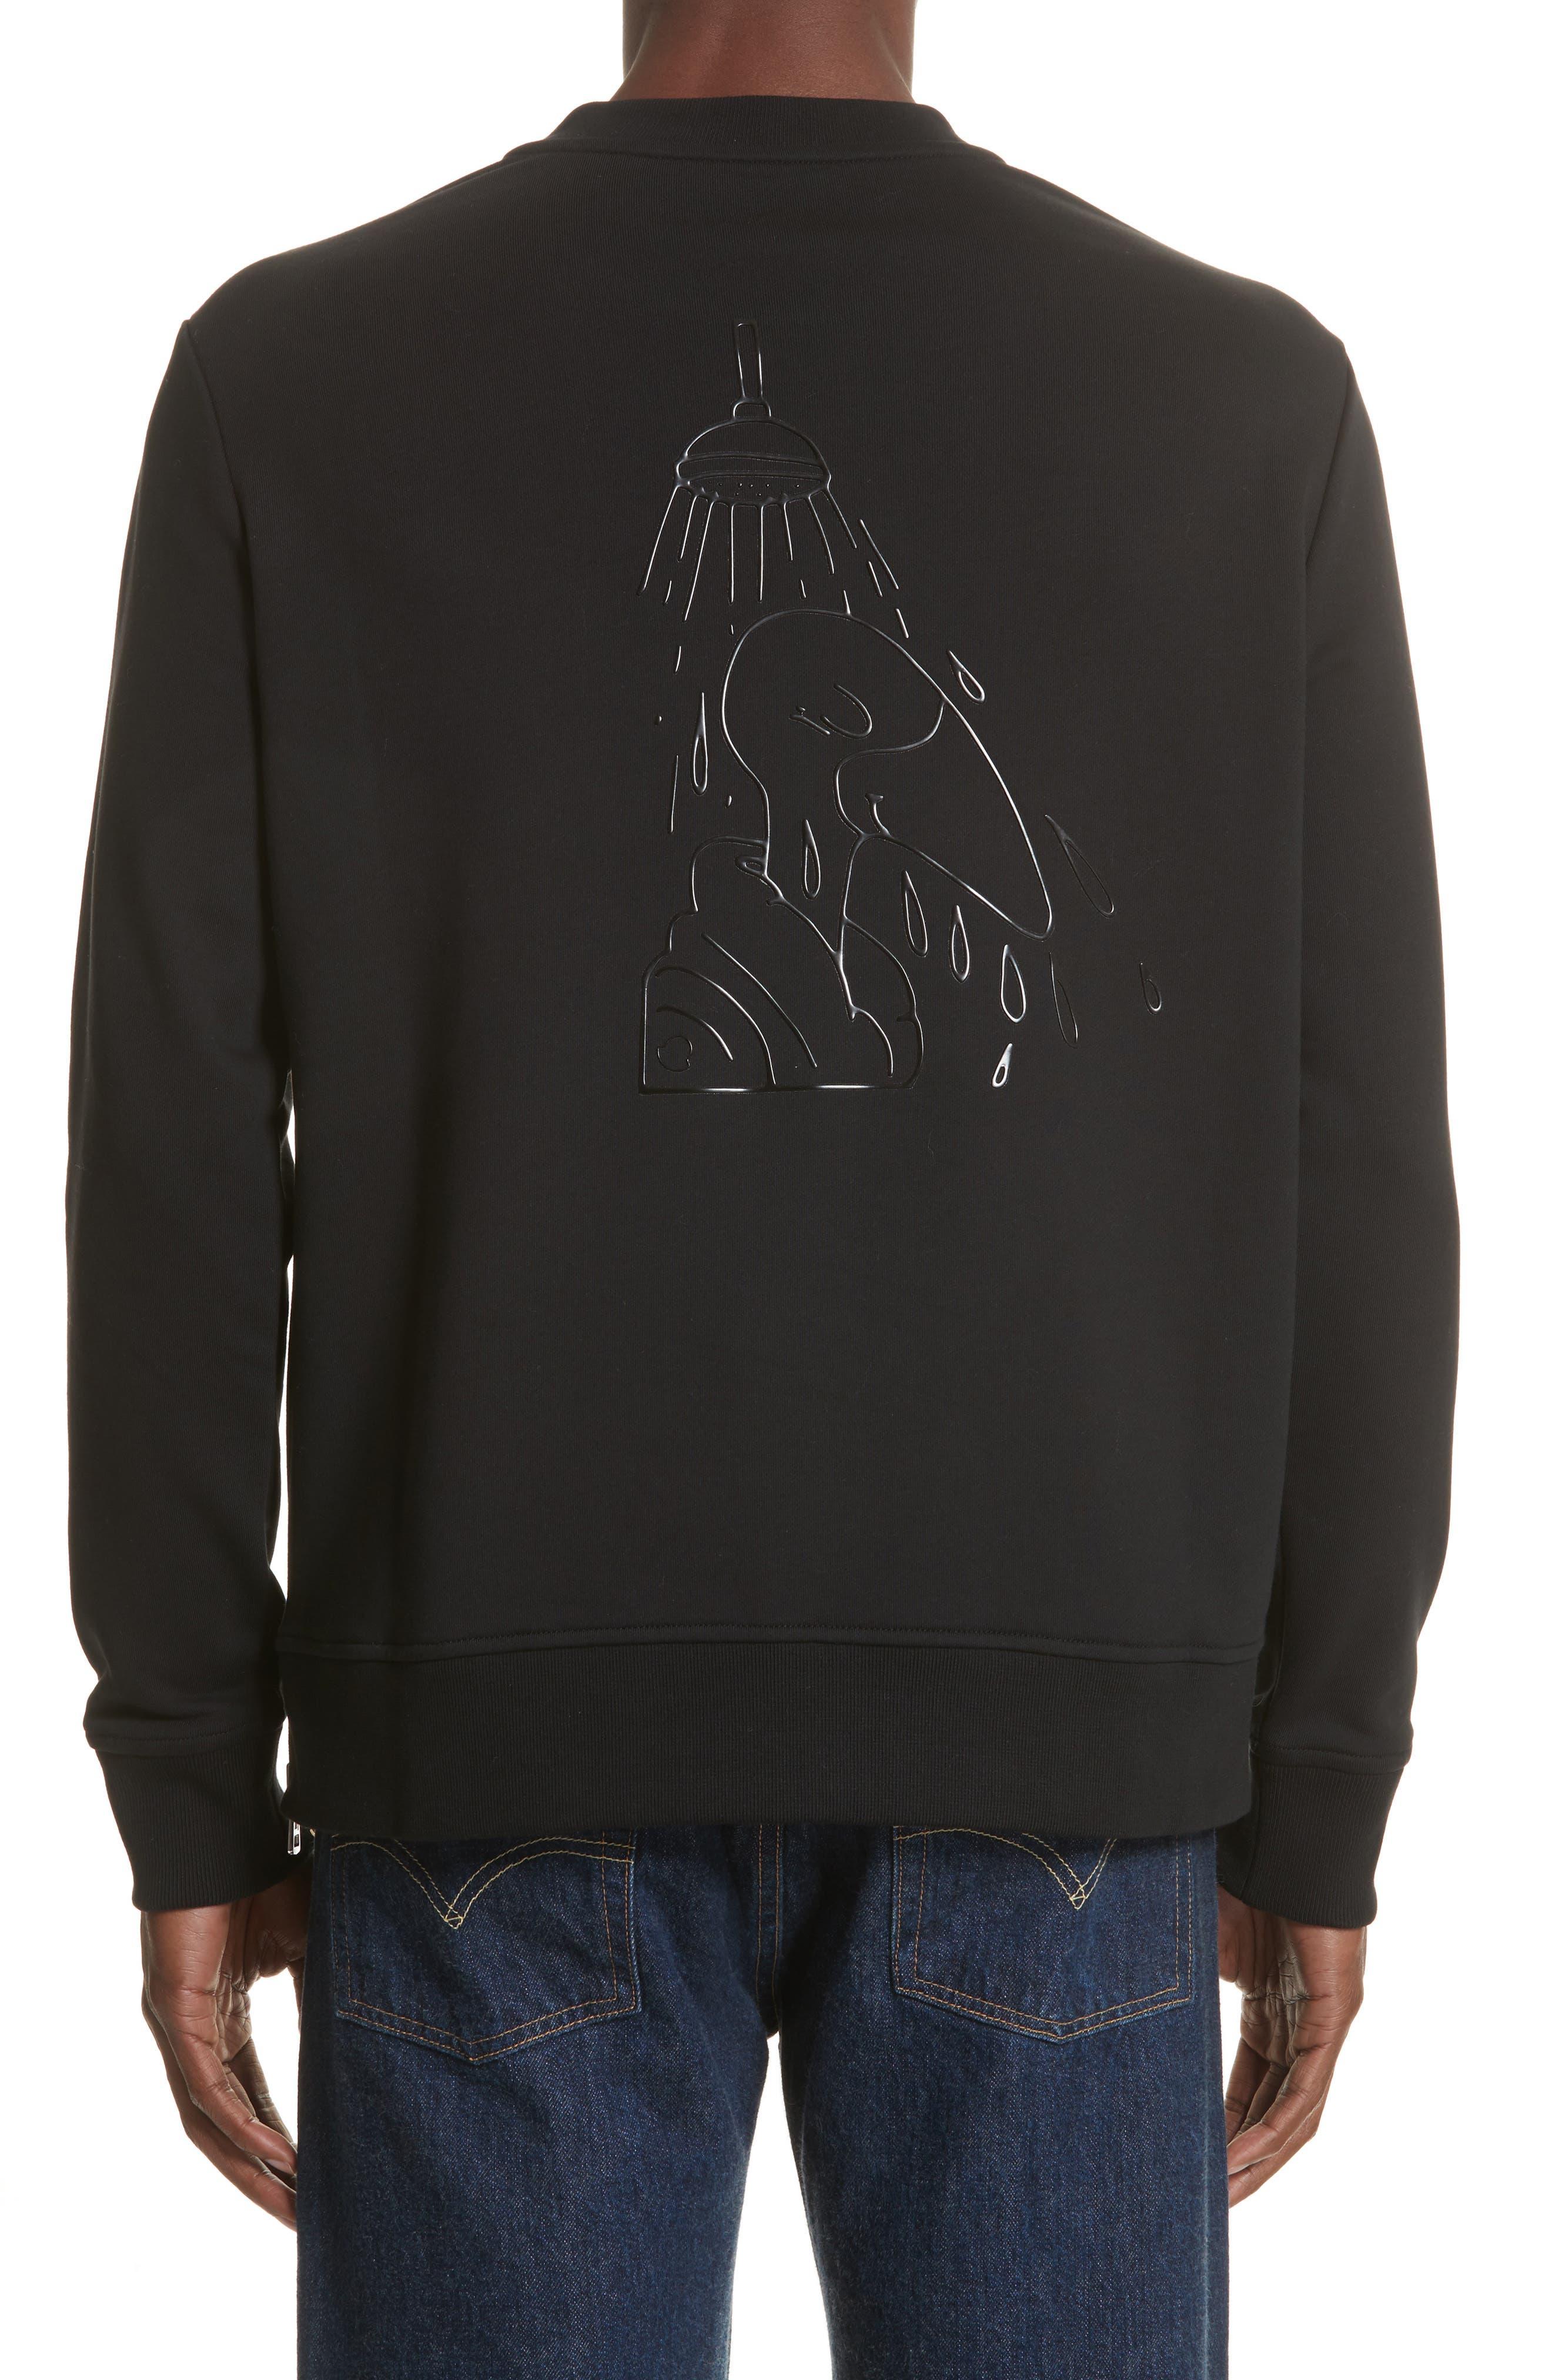 Maglia Griccollo Side Zip Crewneck Sweatshirt,                             Alternate thumbnail 2, color,                             001